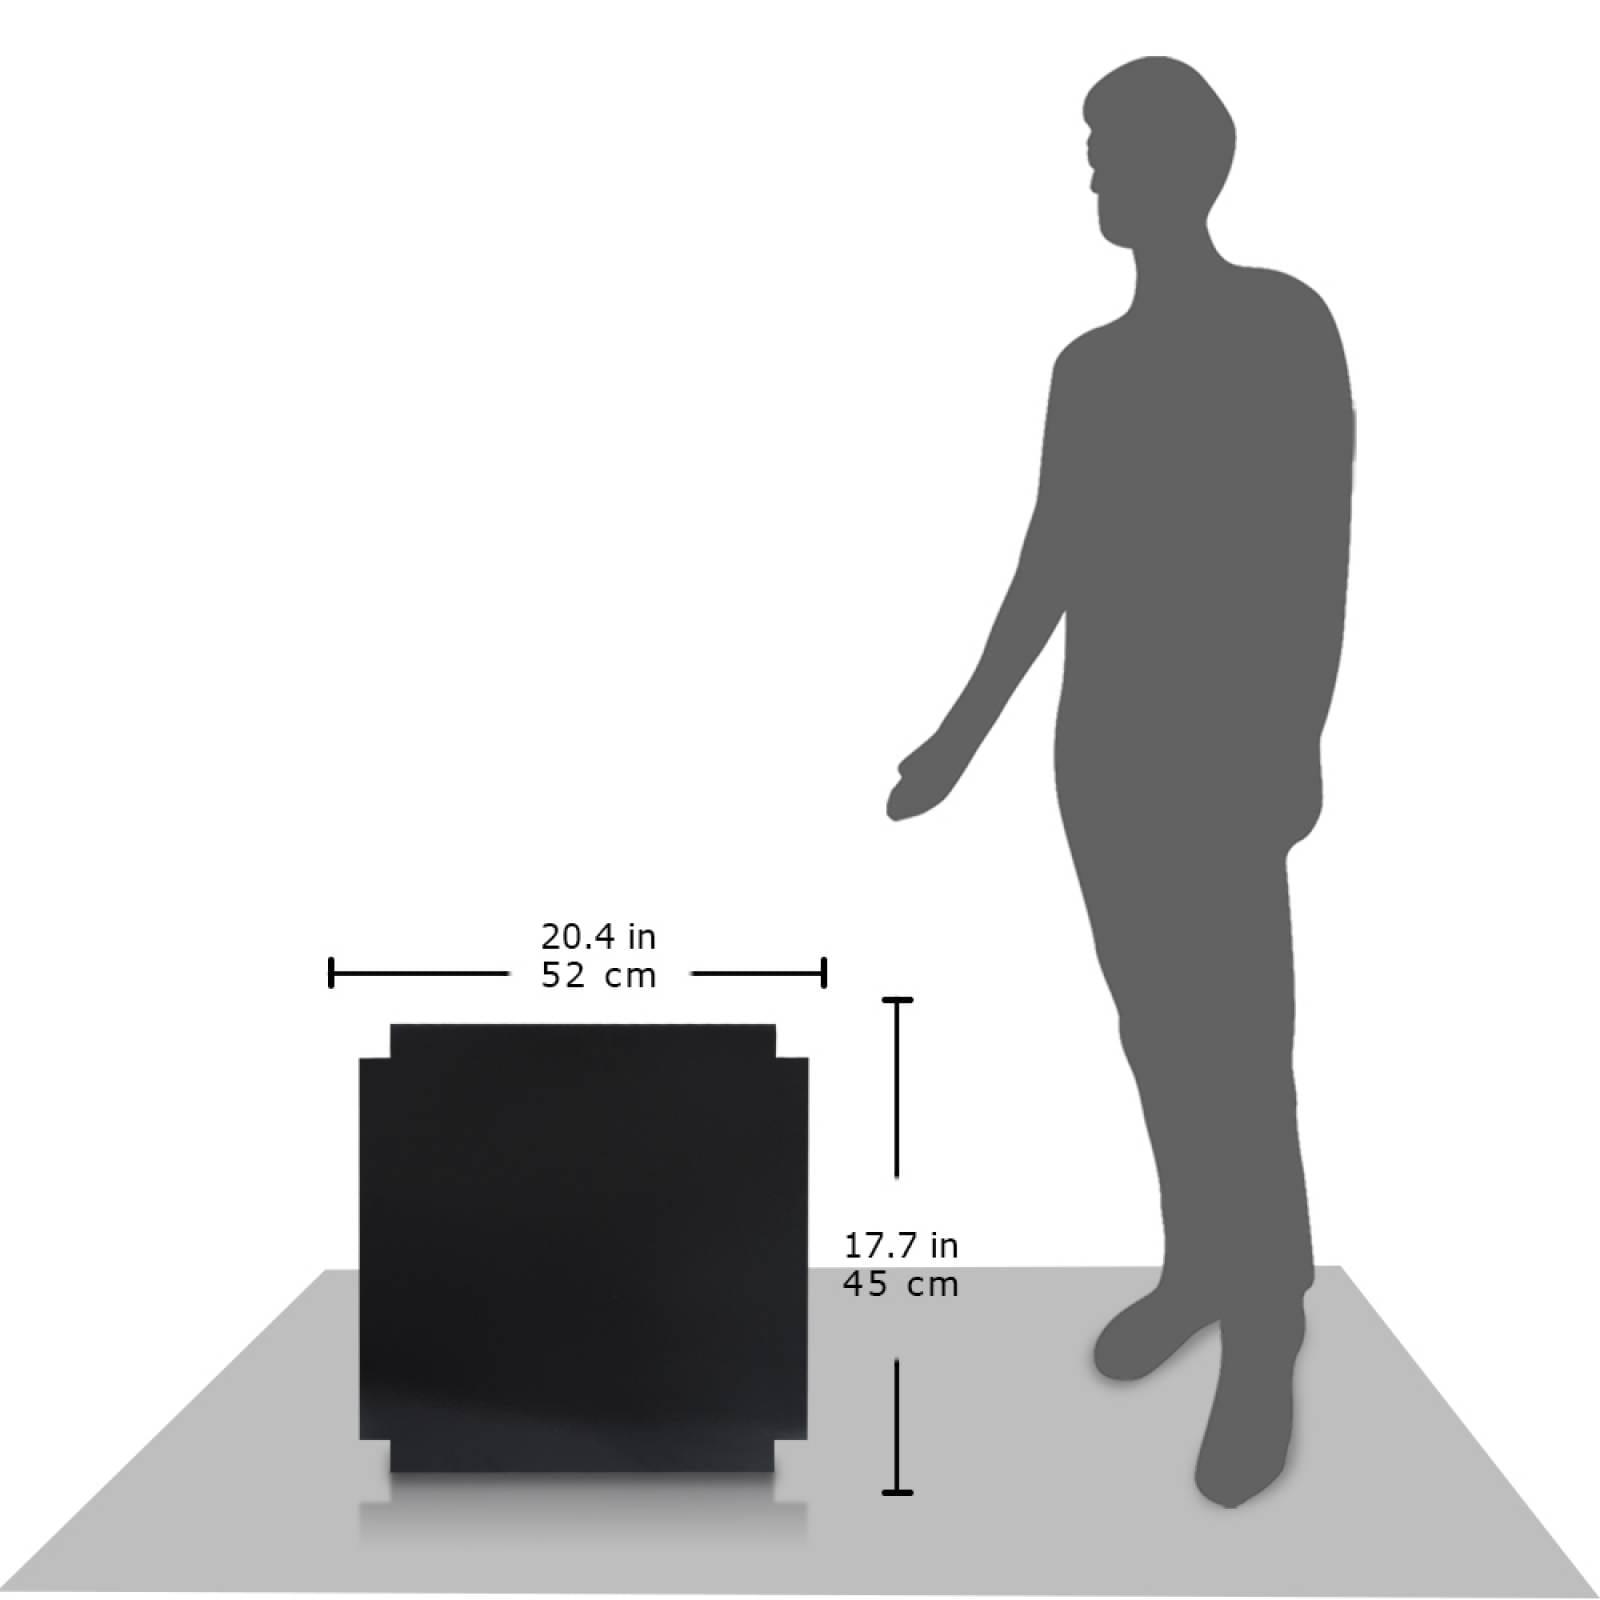 Aislante Cerámico Protector Térmico para Pared de 52 x 45 cm Negro, Mod: 4PTPNe